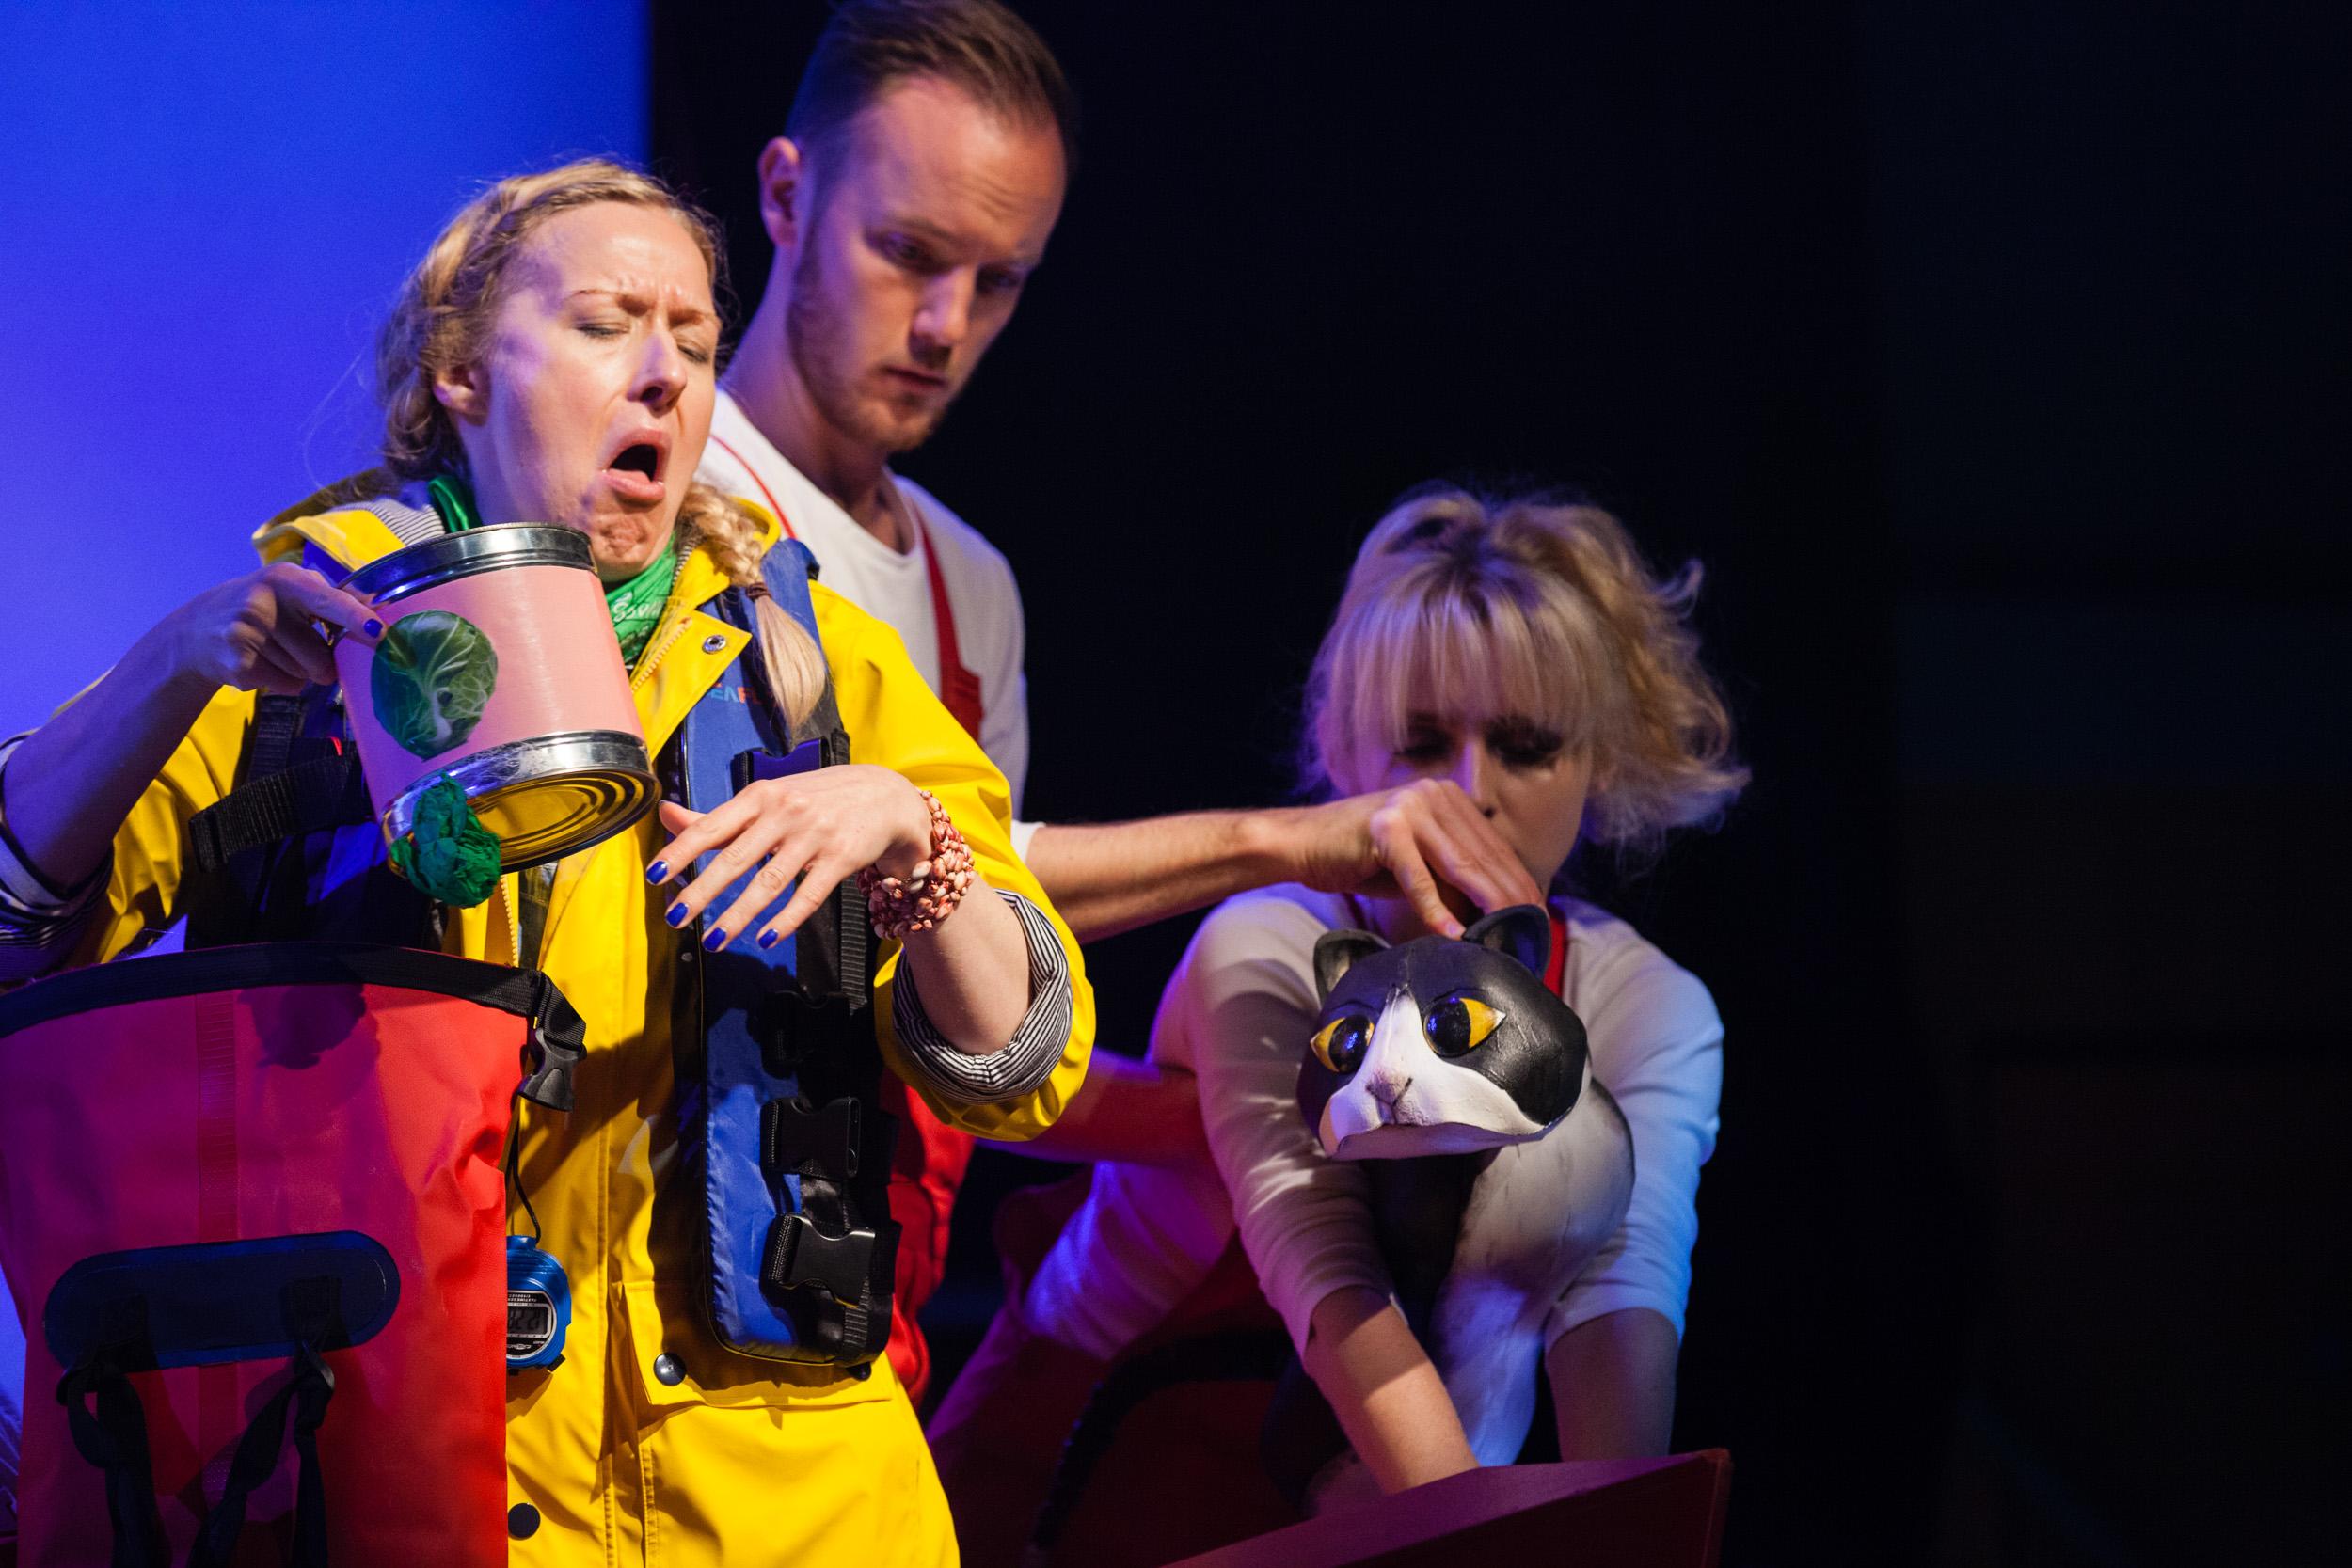 Ulla's Odyssey. OperaUpClose, Kings Place. Sarah Minns, Oskar McCarthy & Pamela Hay. Photo by Christopher Tribble.